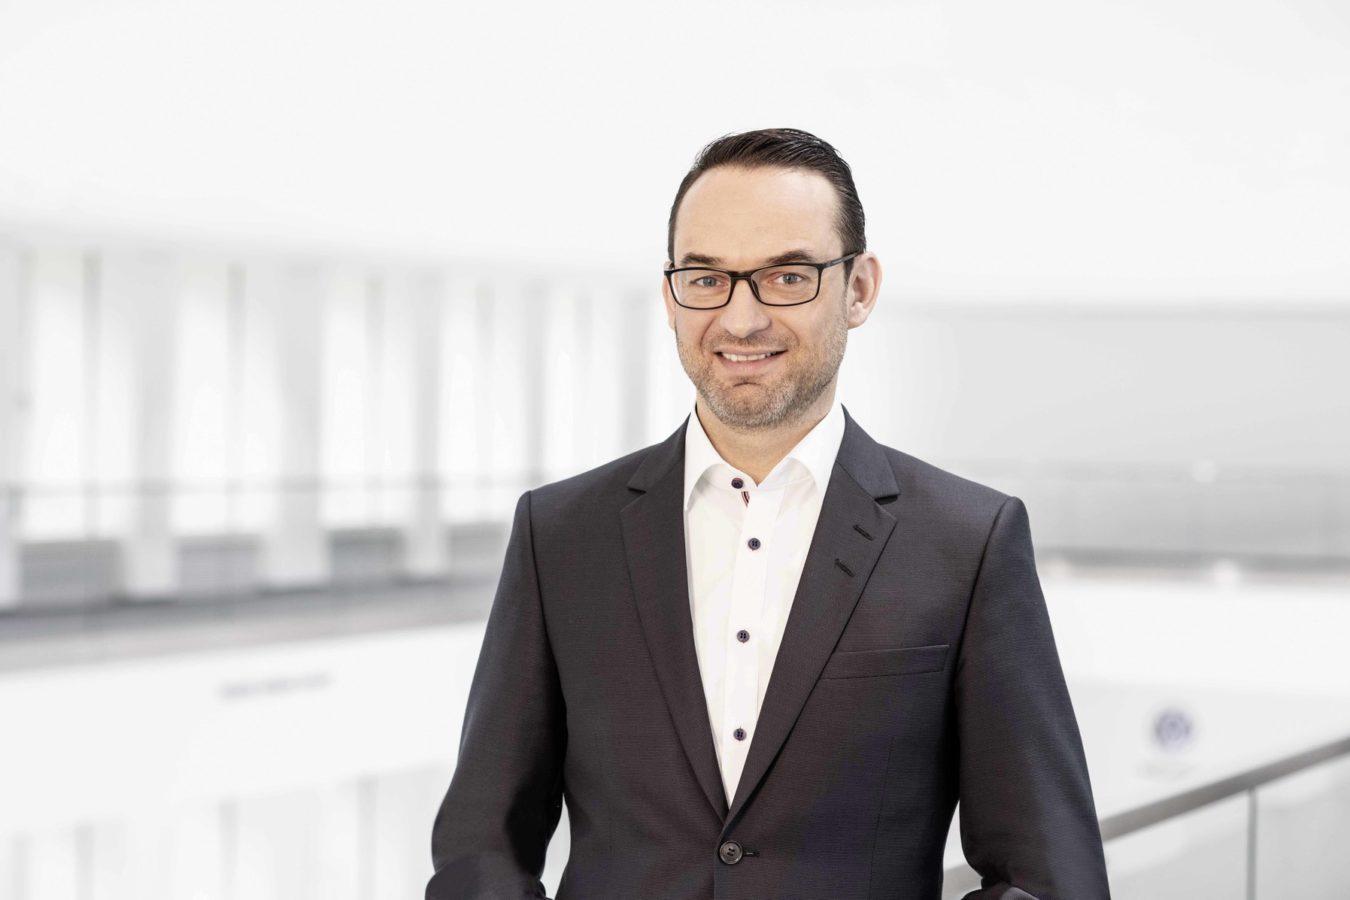 Christian Senger – były szef działu Digital Car & Services.